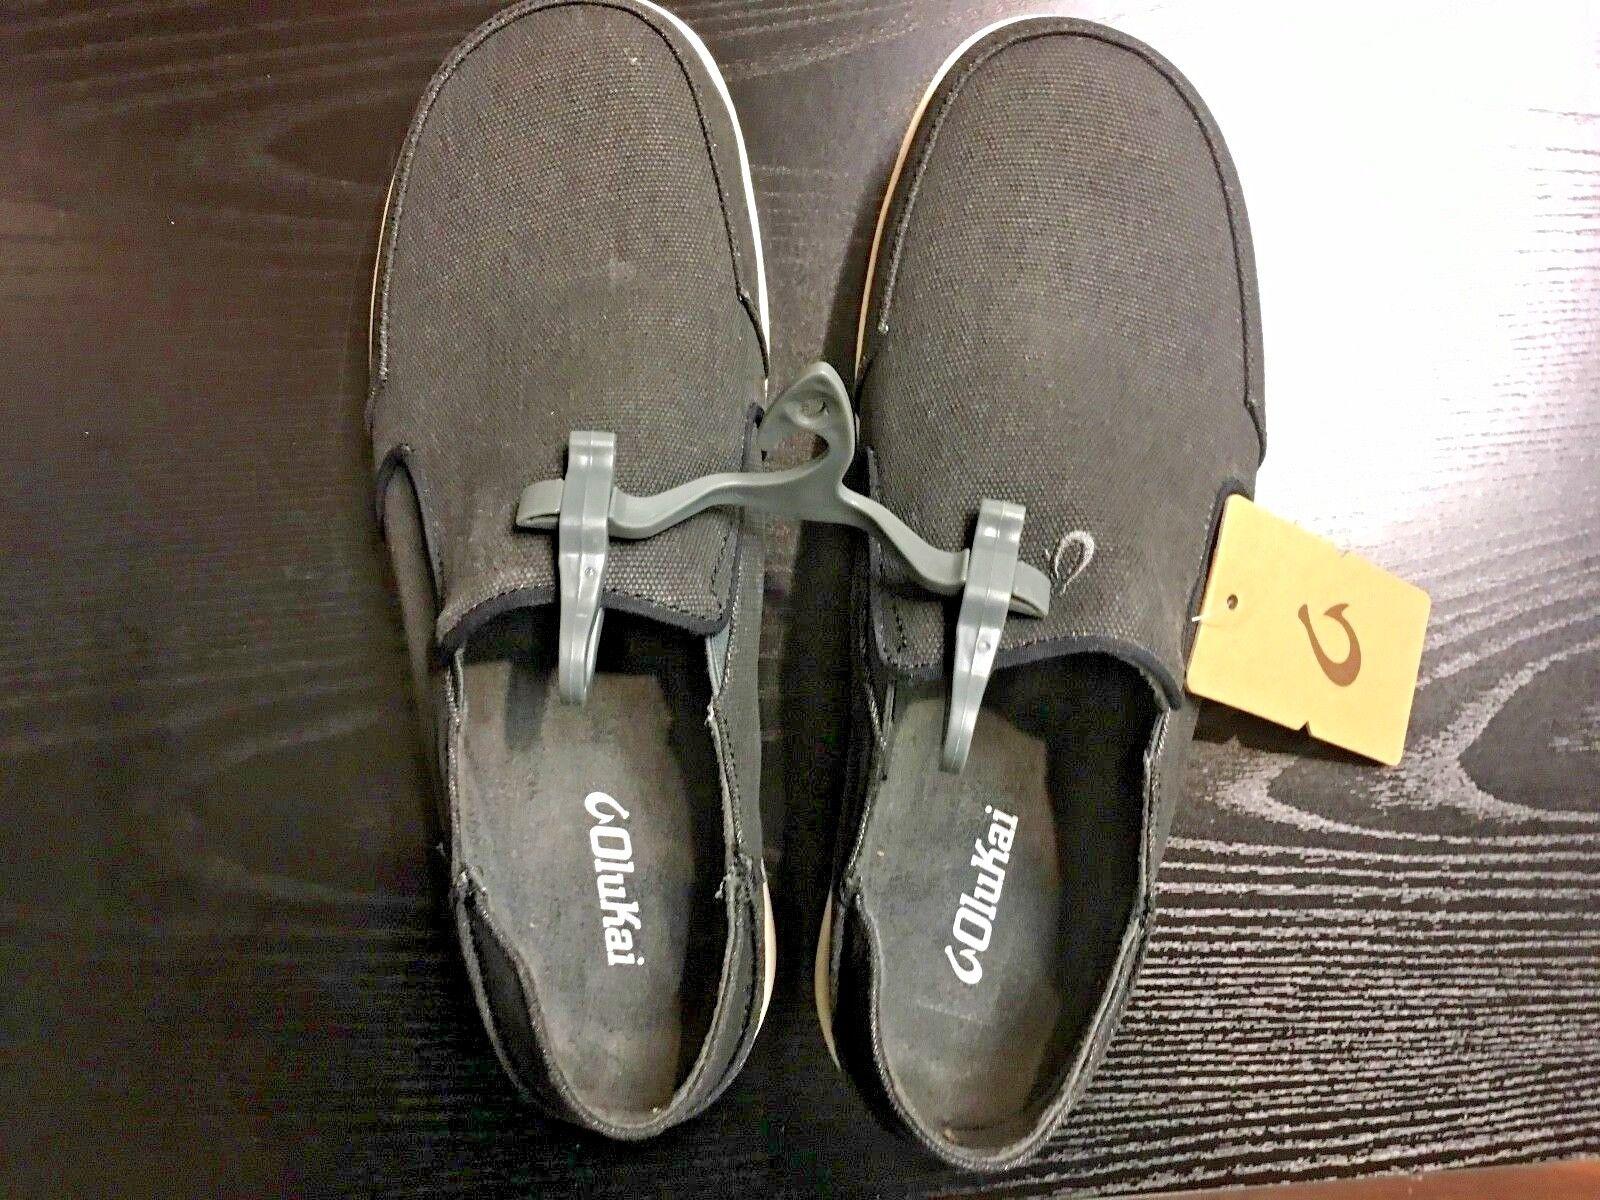 MENS OLUKAI NOHEA LOLE SLIP ON SANDAL zapatos CLAY negro   DK SHADOW Talla 11